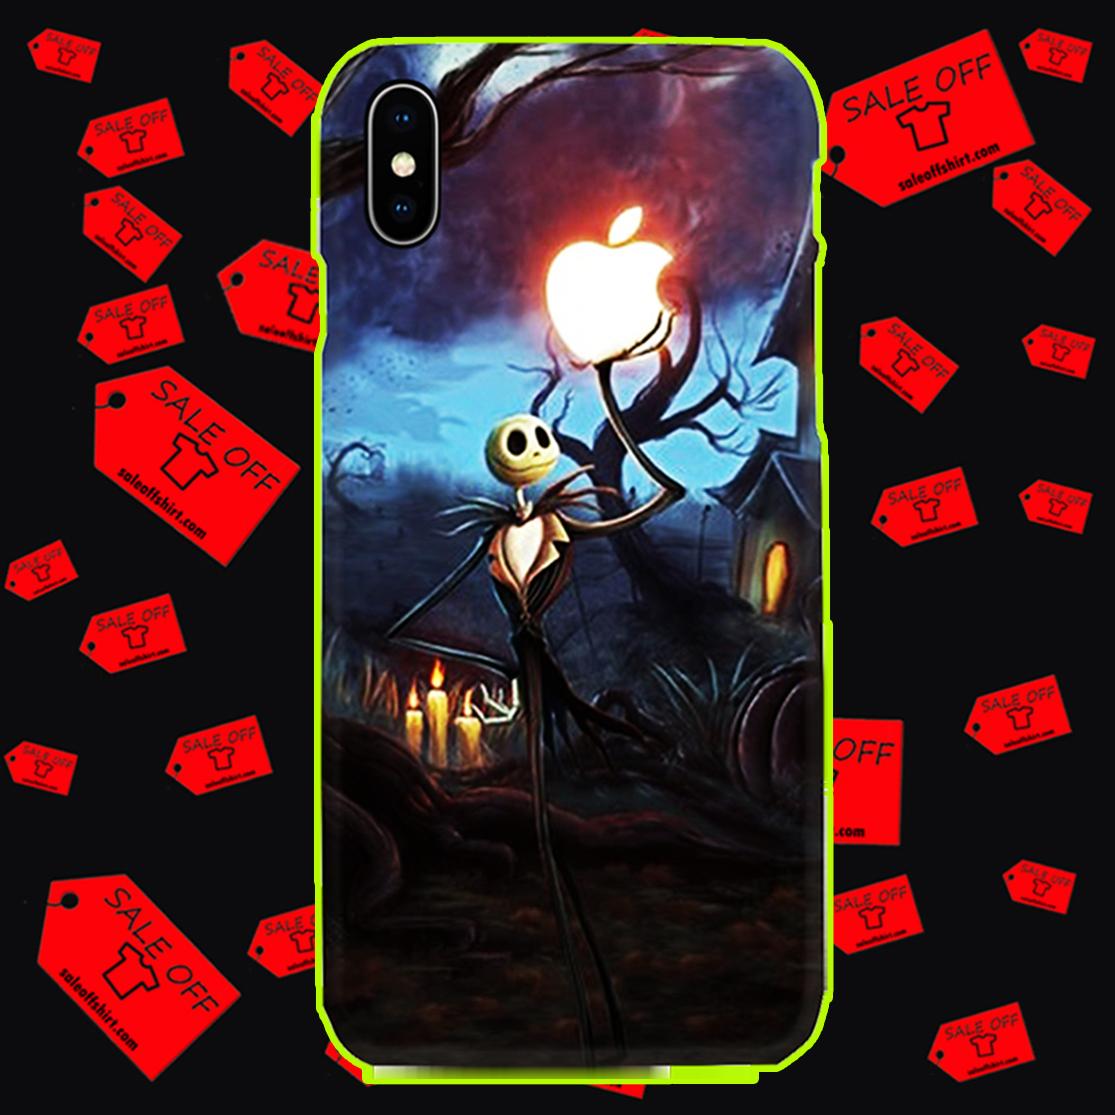 Jack Skellington Apple phone case - iphone XS max case